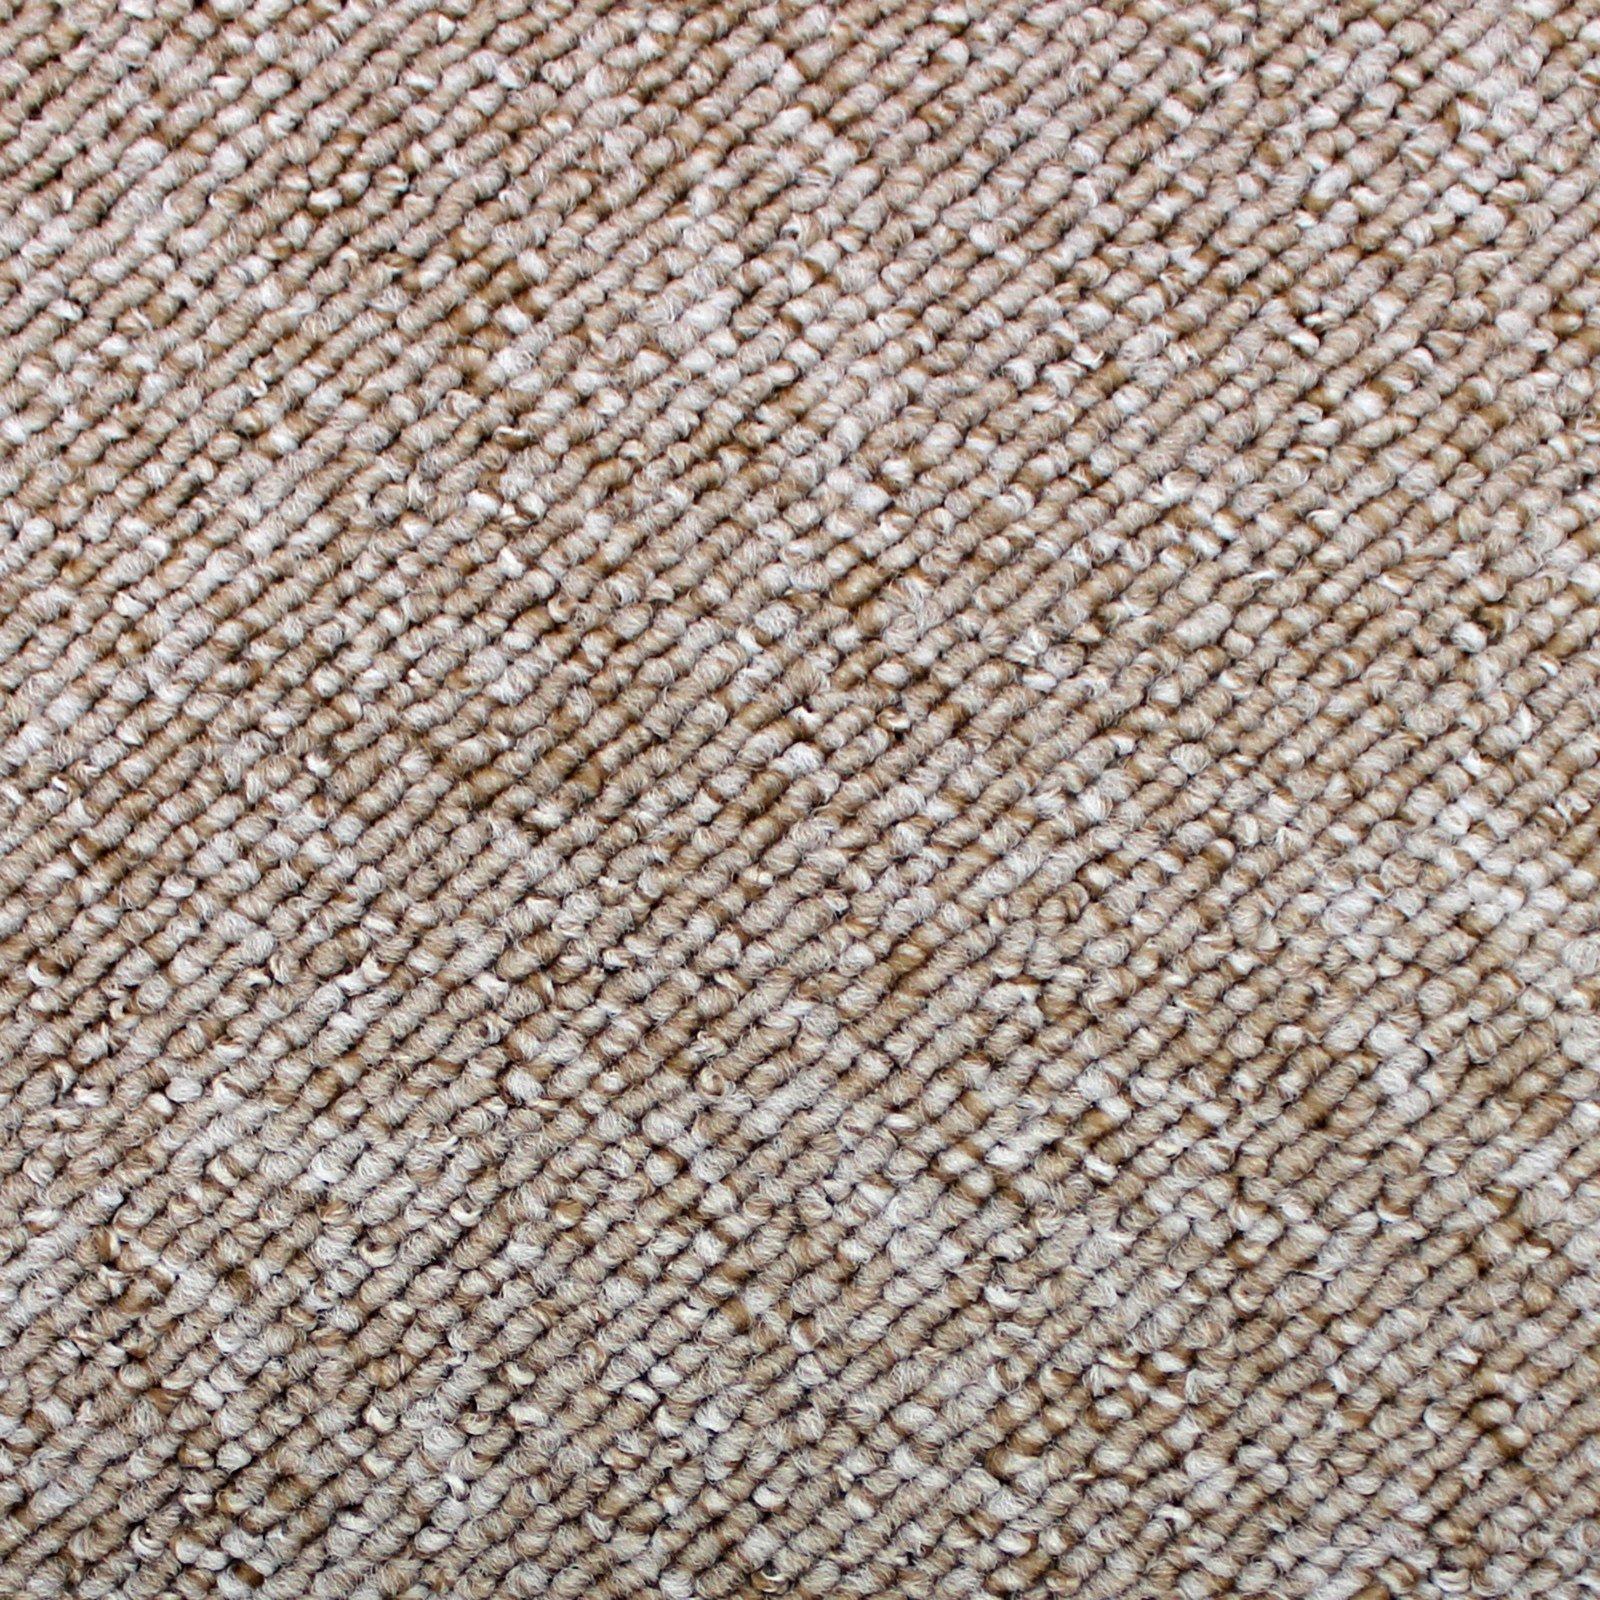 teppichboden regensburg beige 4 meter breit teppichboden bodenbel ge renovieren. Black Bedroom Furniture Sets. Home Design Ideas